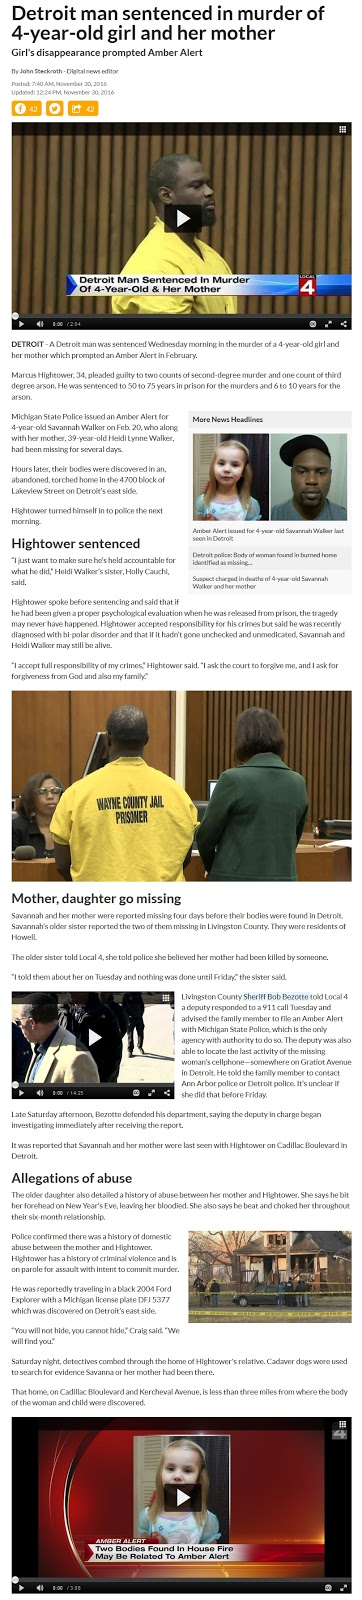 MI; black ex con murders white ex, 4-yo daughter - sentenced - Savannah, Heidi Walker (11-30-16) (1)